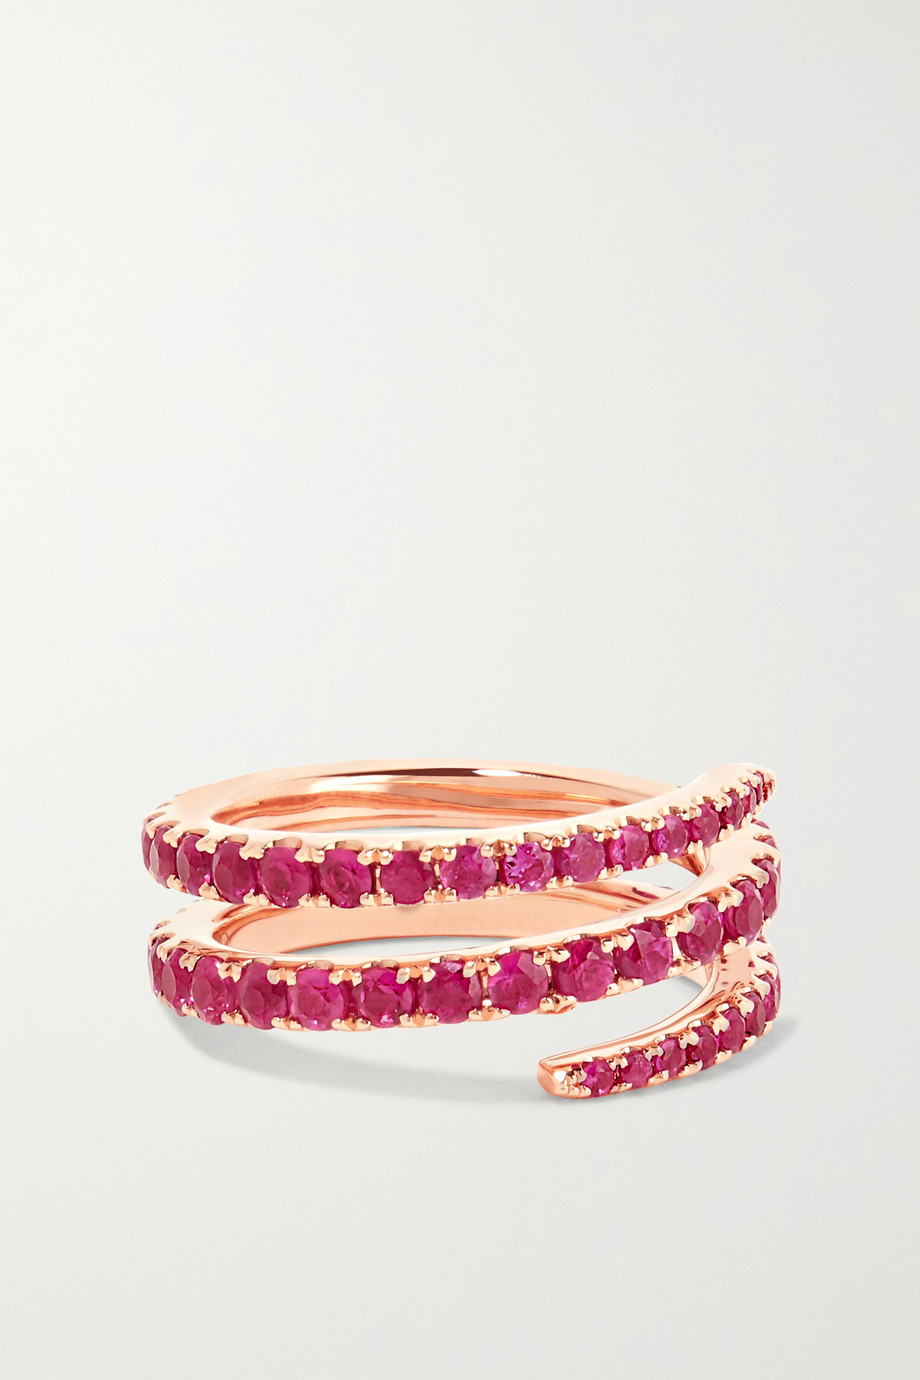 Anita Ko Bague de petit doigt en or rose 18 carats et rubis